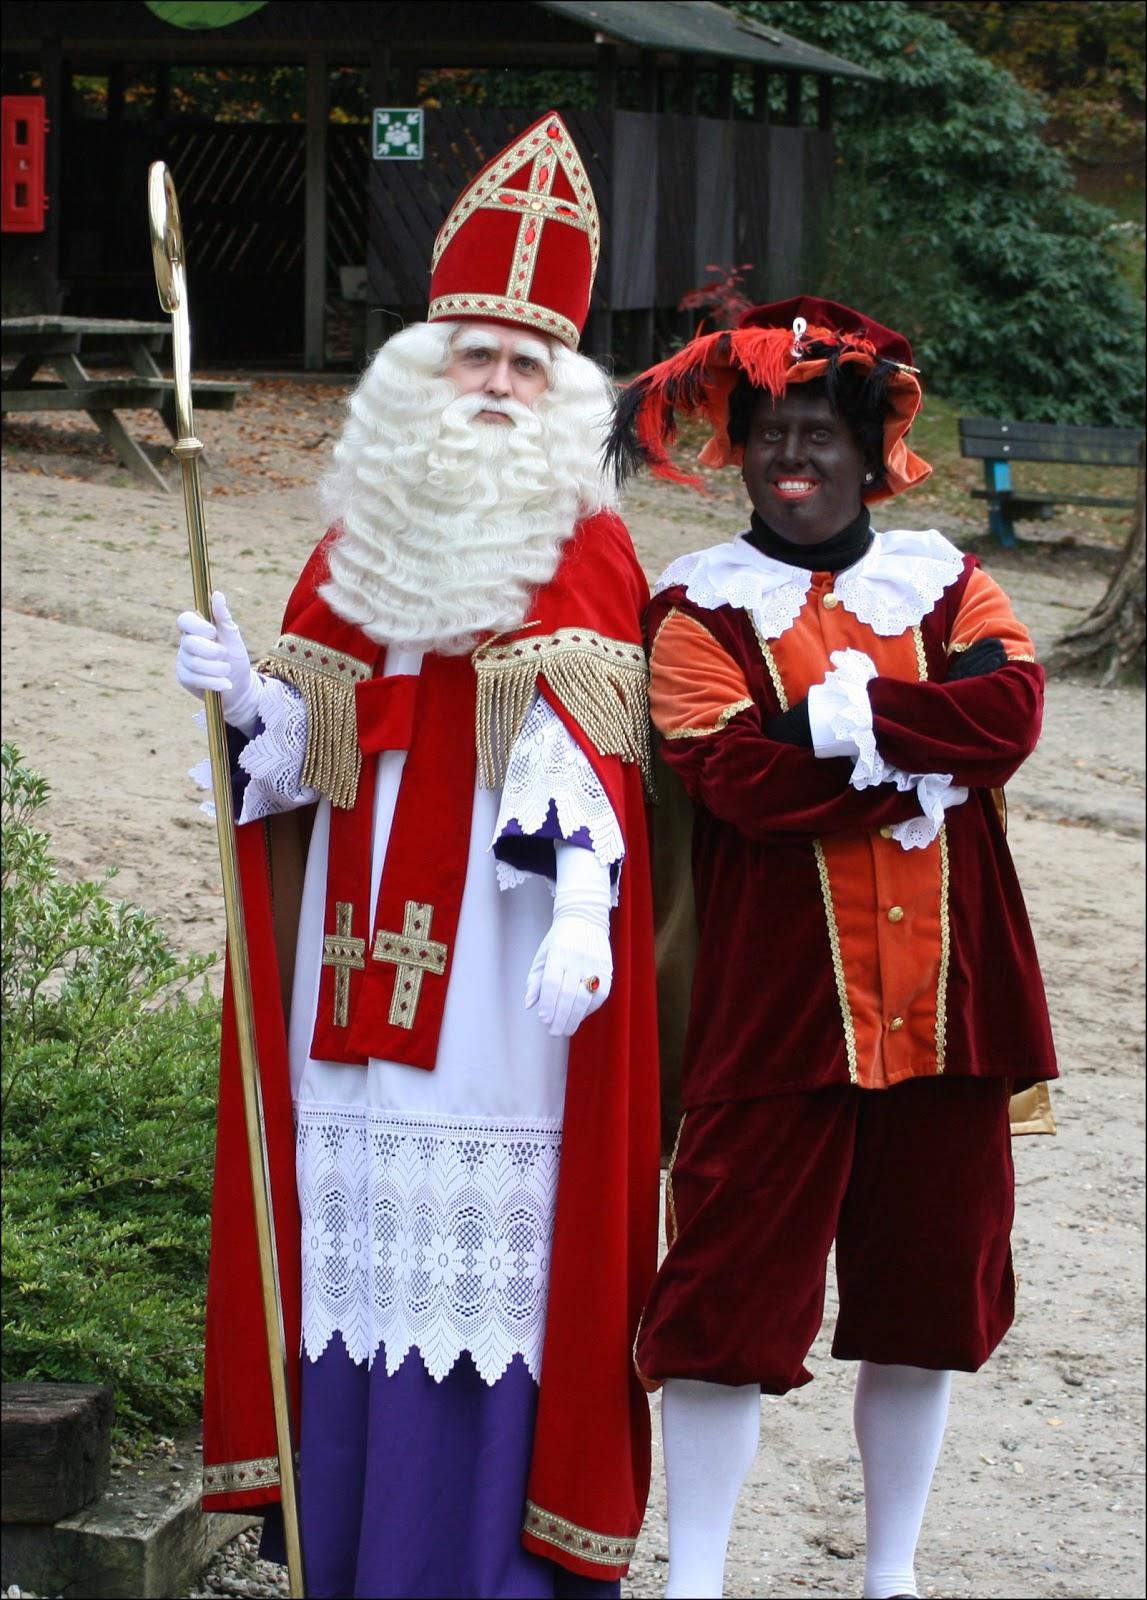 Синтерклаас и Чёрный Пит. Фото: Tenorio81/Wikimedia/CC-BY-3.0.